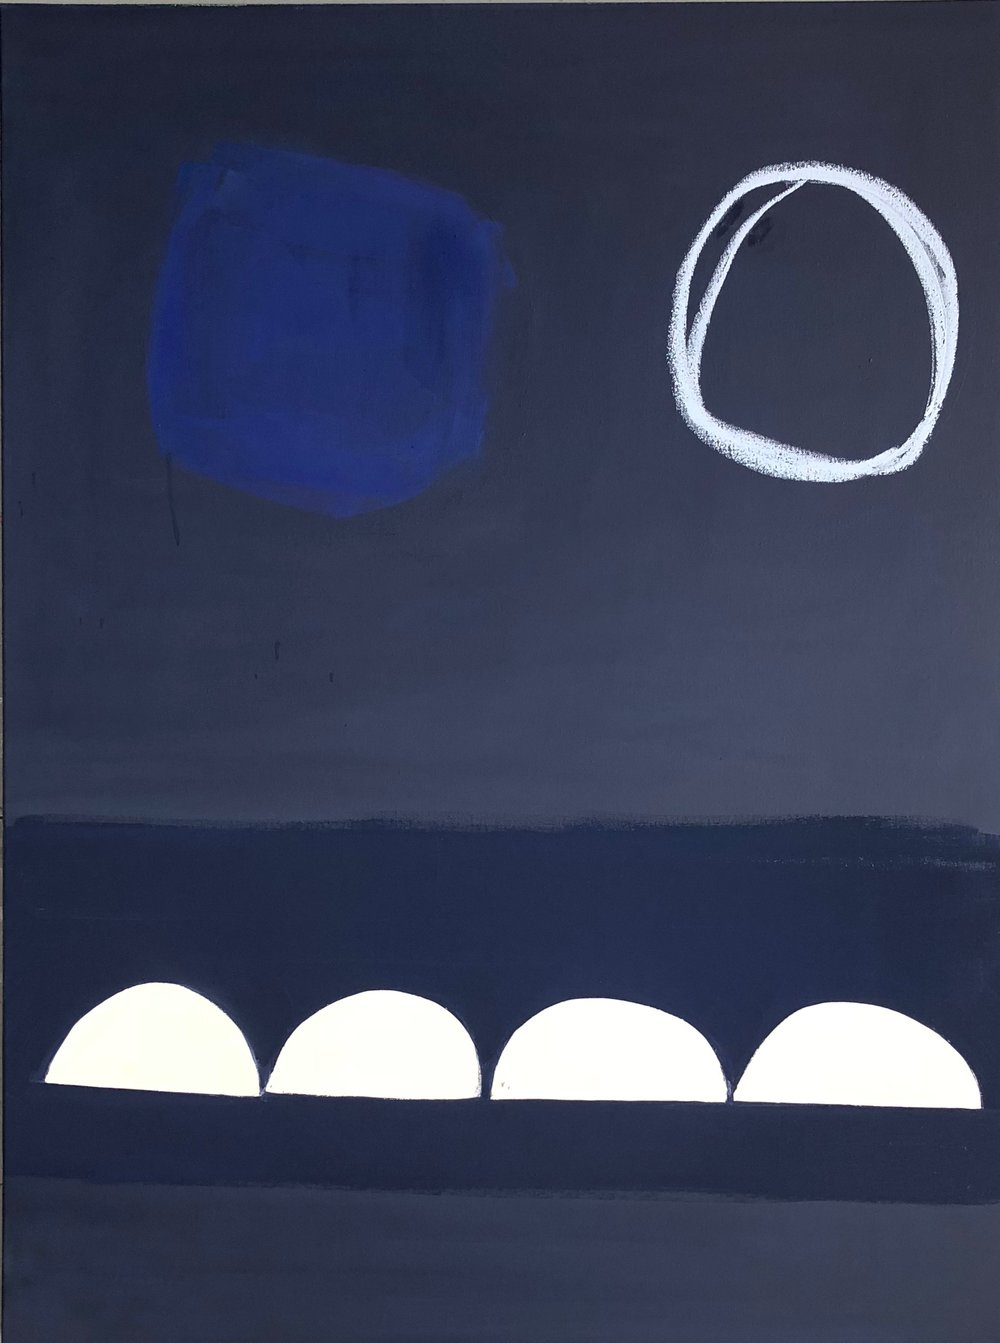 Midnight Blue and Cobalt